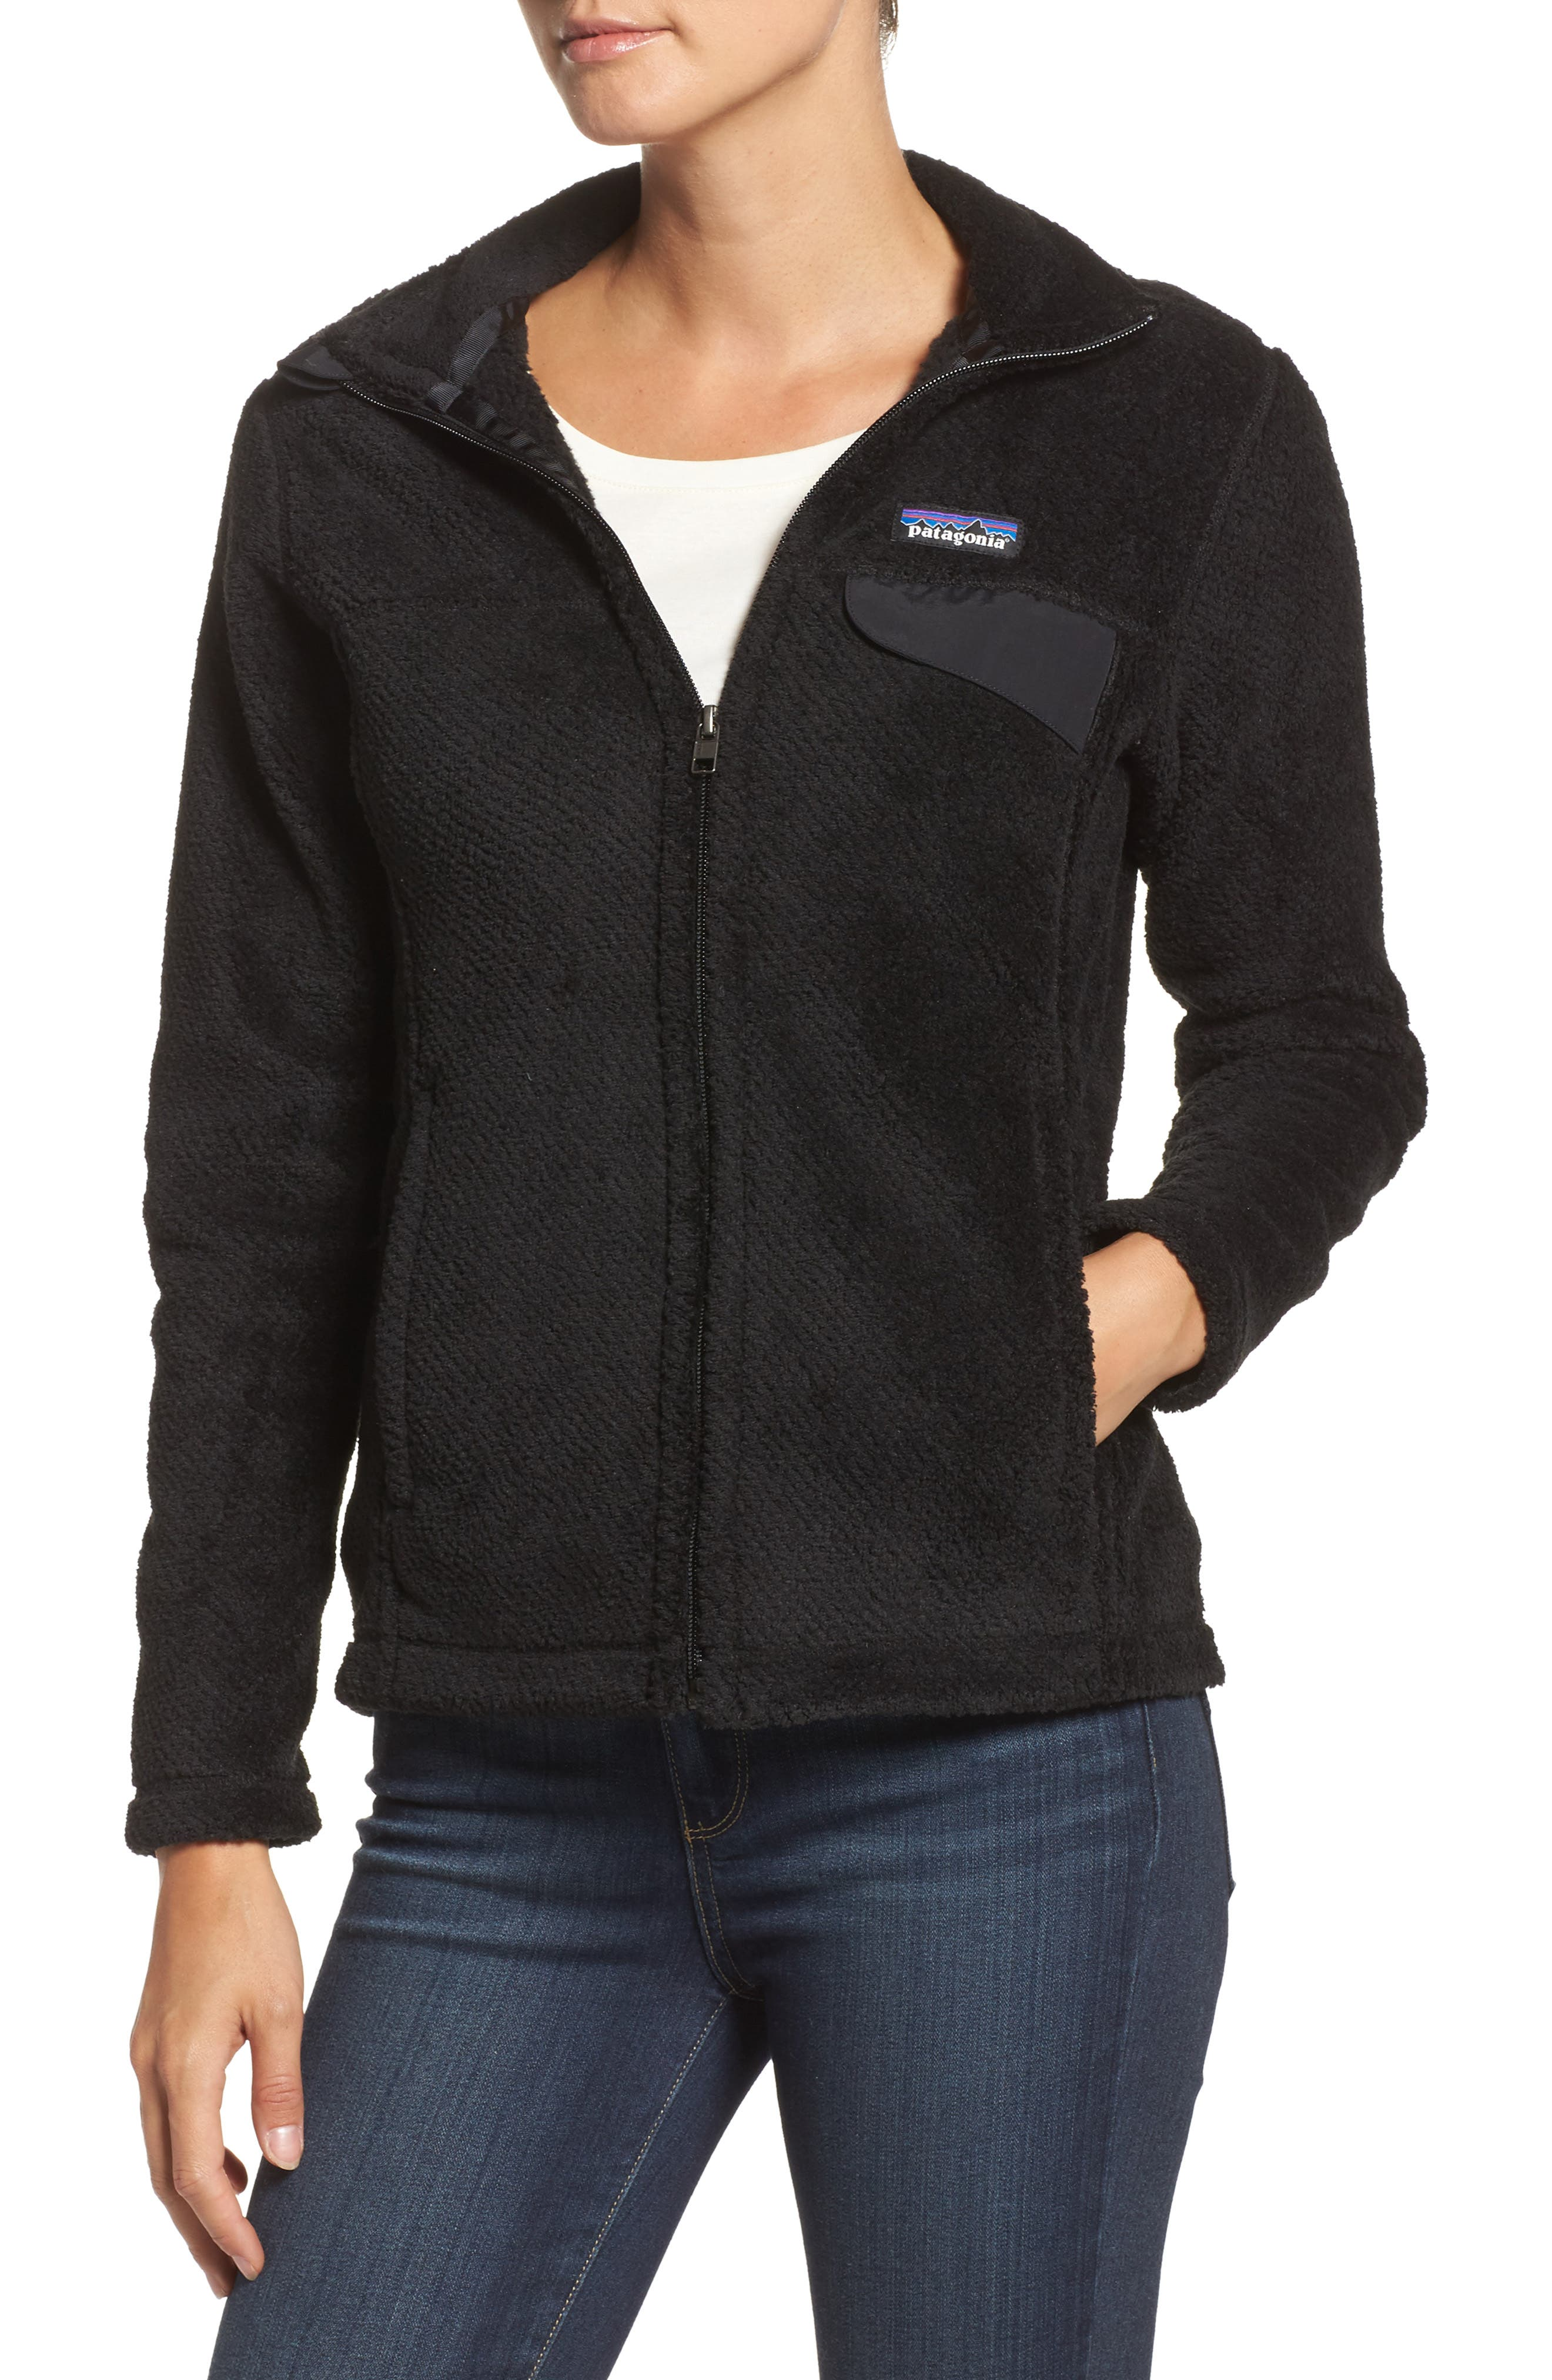 Patagonia Full Zip Re-Tool Fleece Jacket